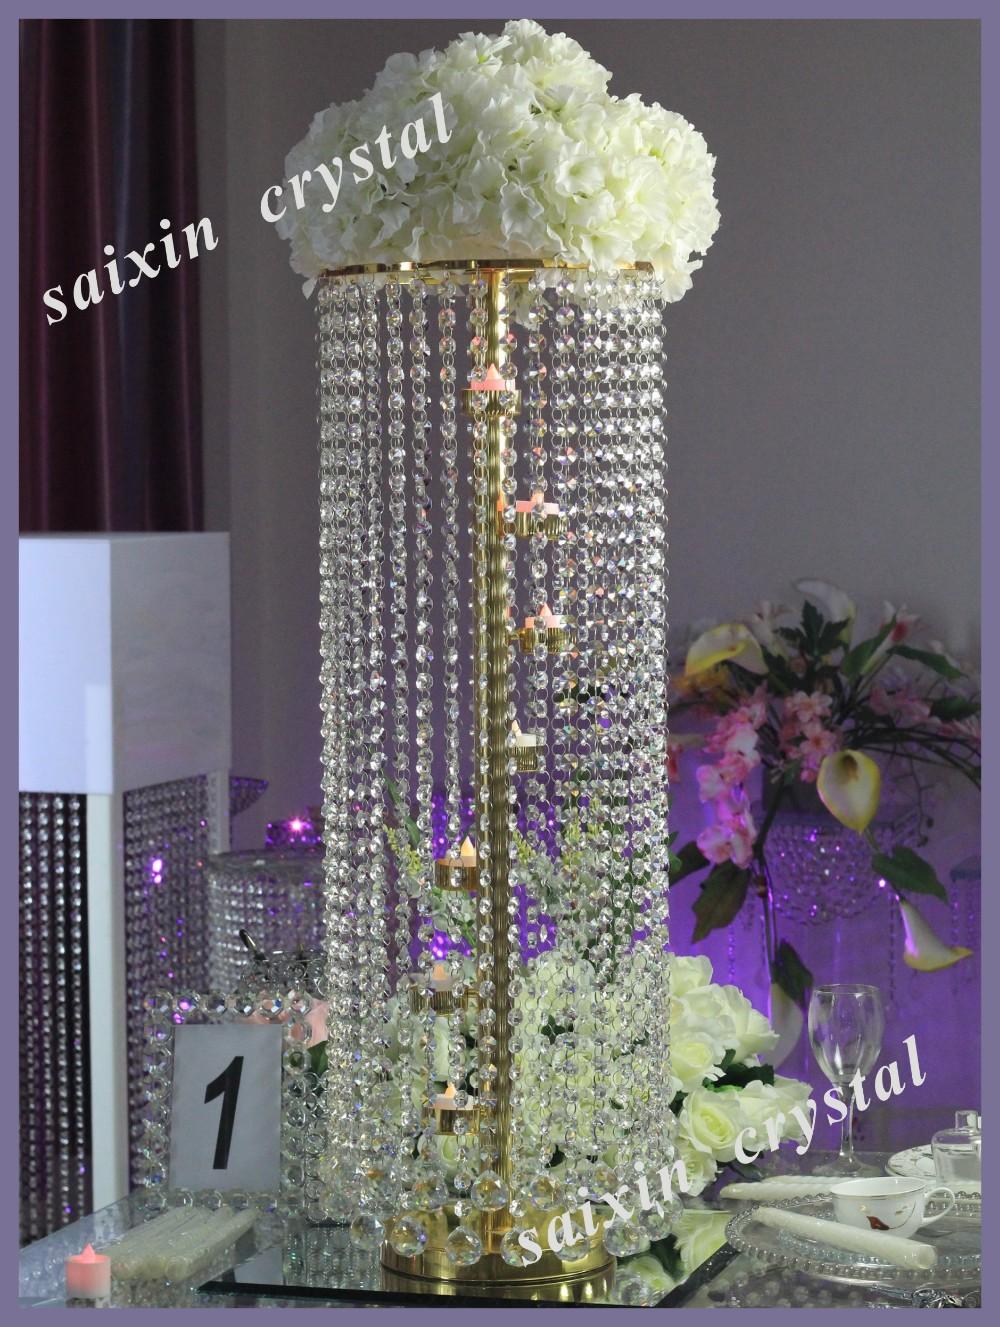 Event Decor Led Light Crystal Walkway Pillar Zt 220b Buy